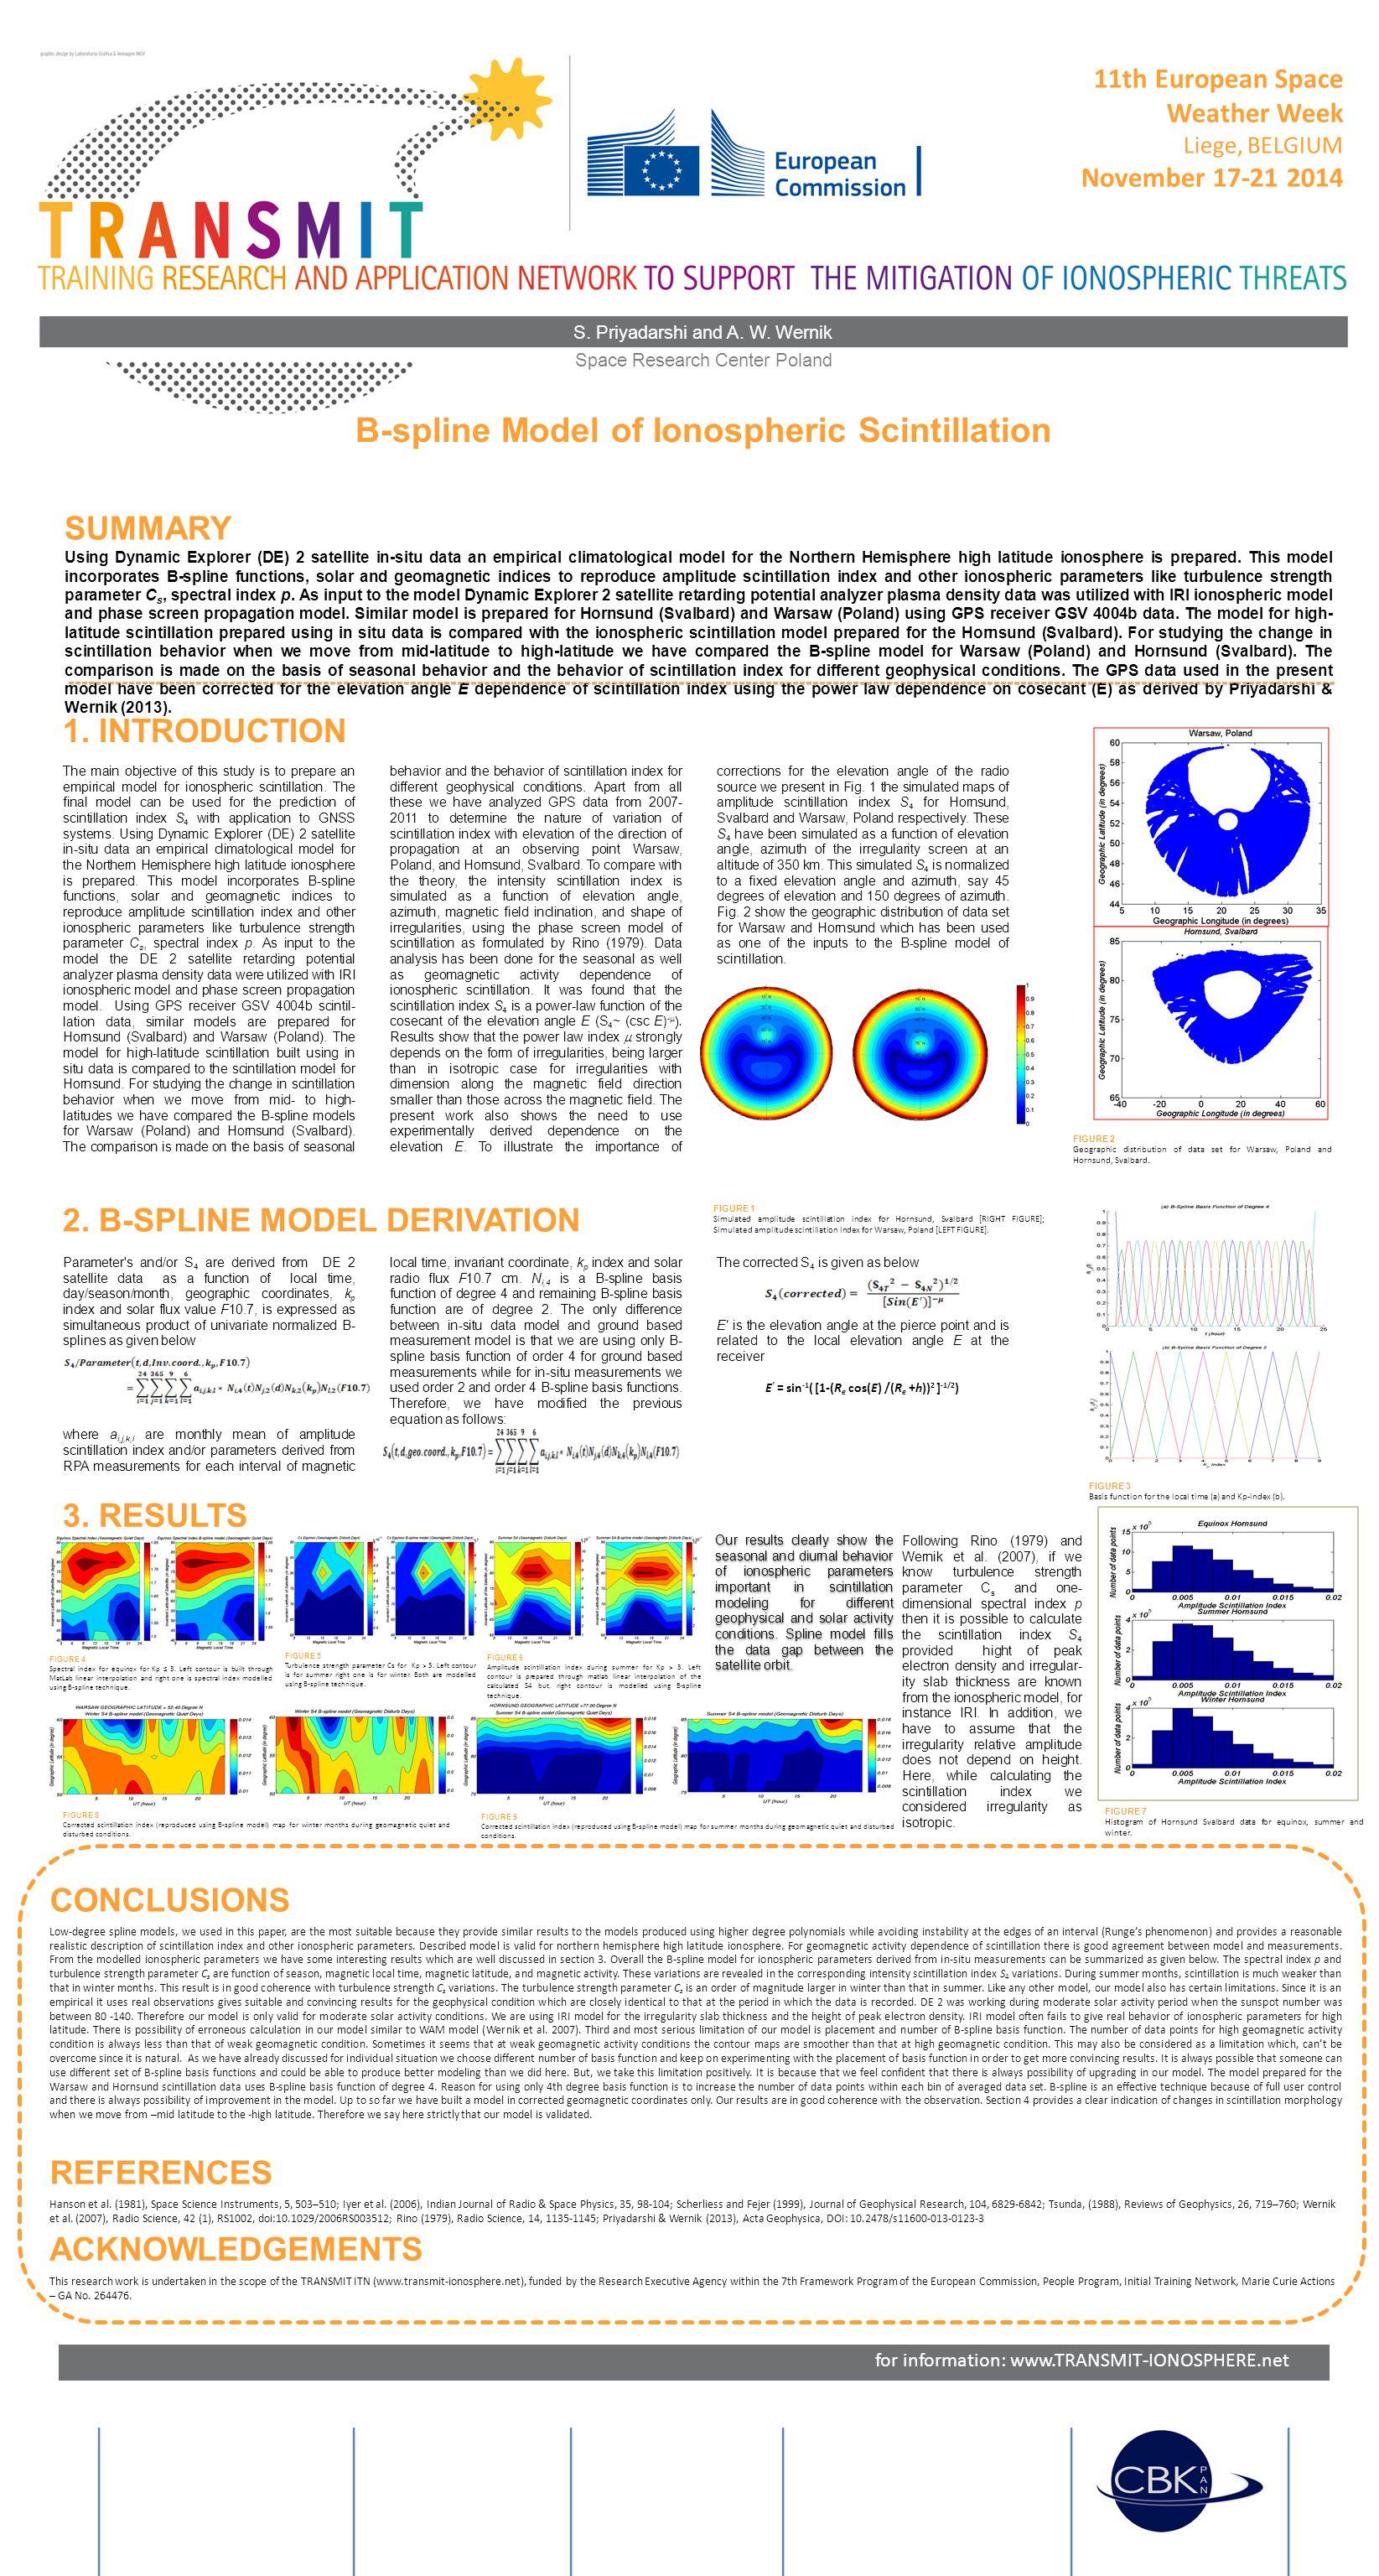 B-spline Model of Ionospheric Scintillation 11th European Space Weather Week Liege, BELGIUM November 17-21 2014 S. Priyadarshi and A. W. Wernik Space